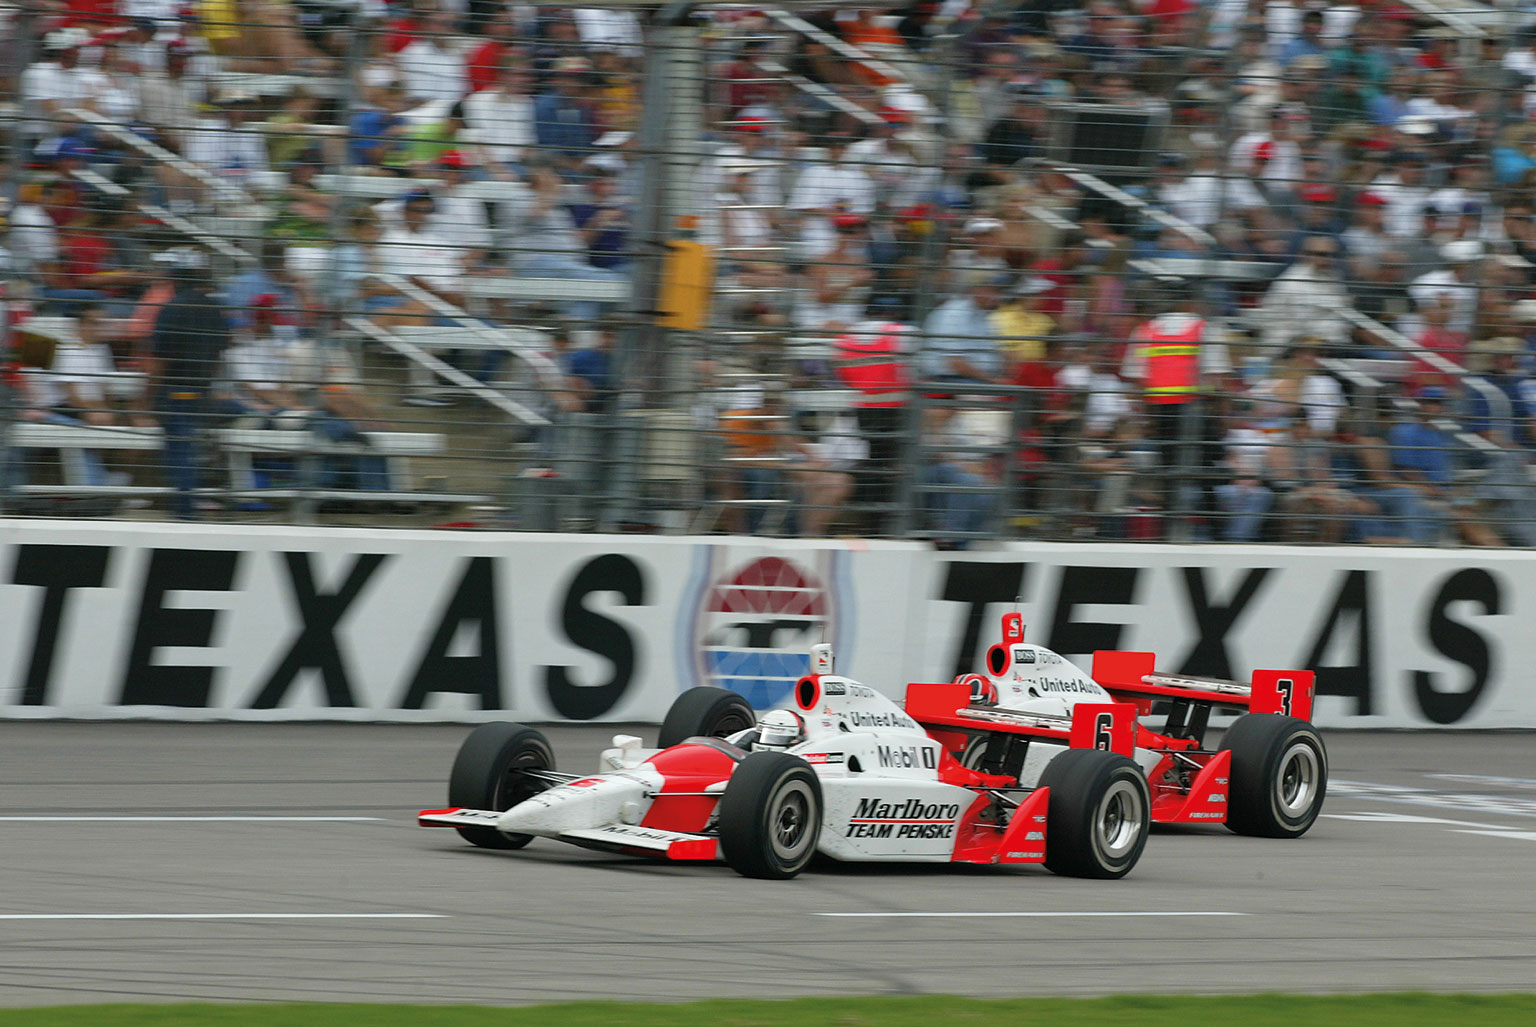 2003LATmkim-IRL-Texas